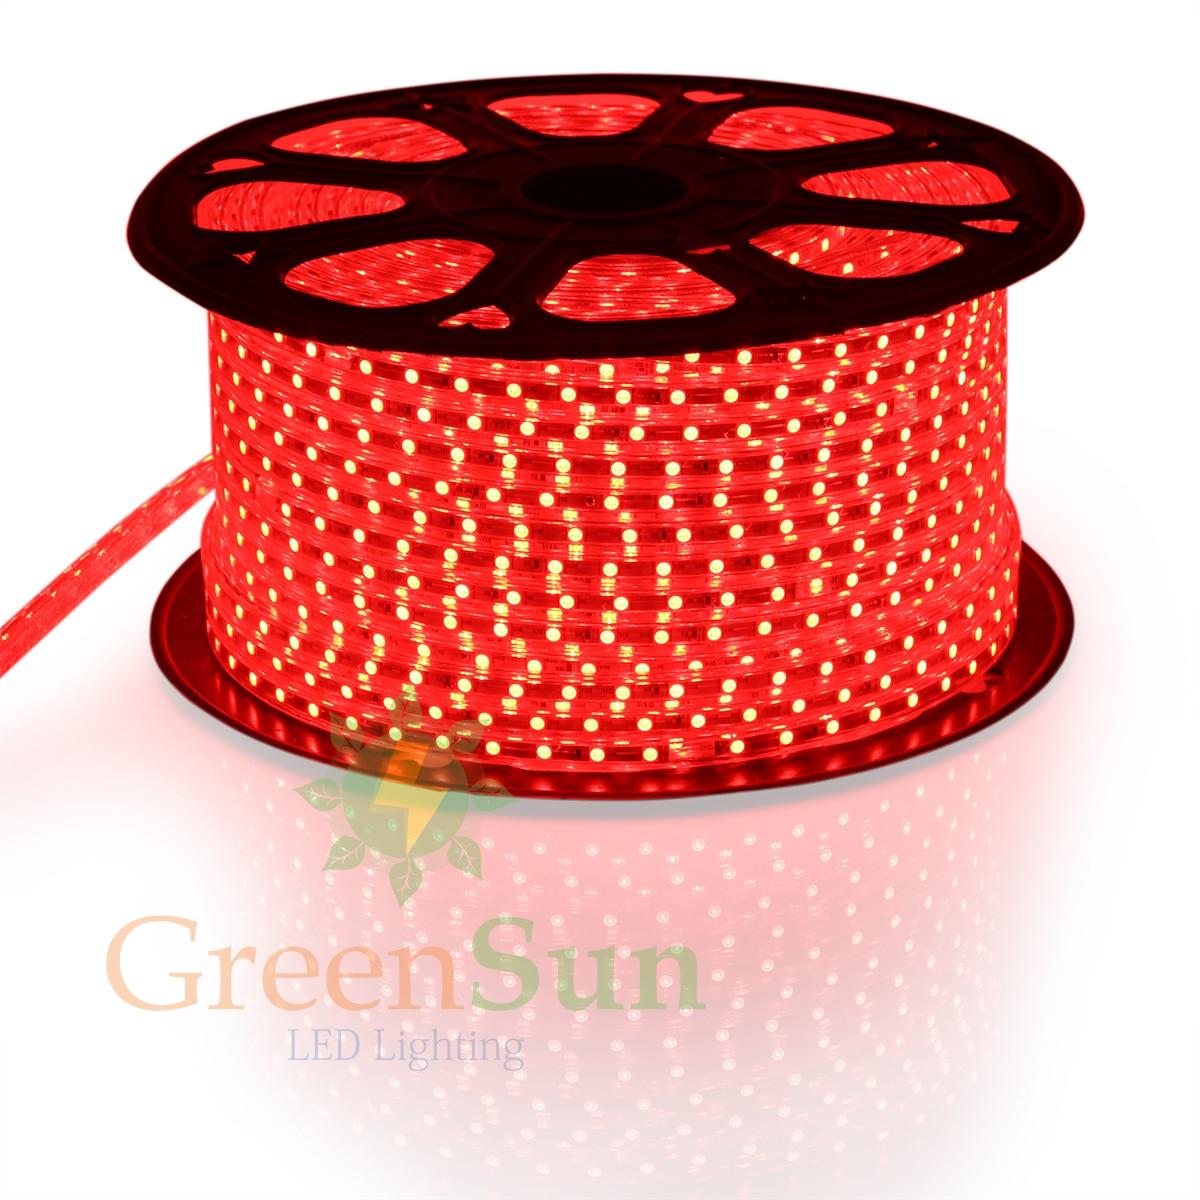 Red Color LED Strip Light 20-100M 60 LEDs/ meter Ultra Bright 5050 SMD LED Outdoor Garden Home Strip Rope Light Waterproof 0 9m smd 3528 90 leds waterproof led rope light festival lighting